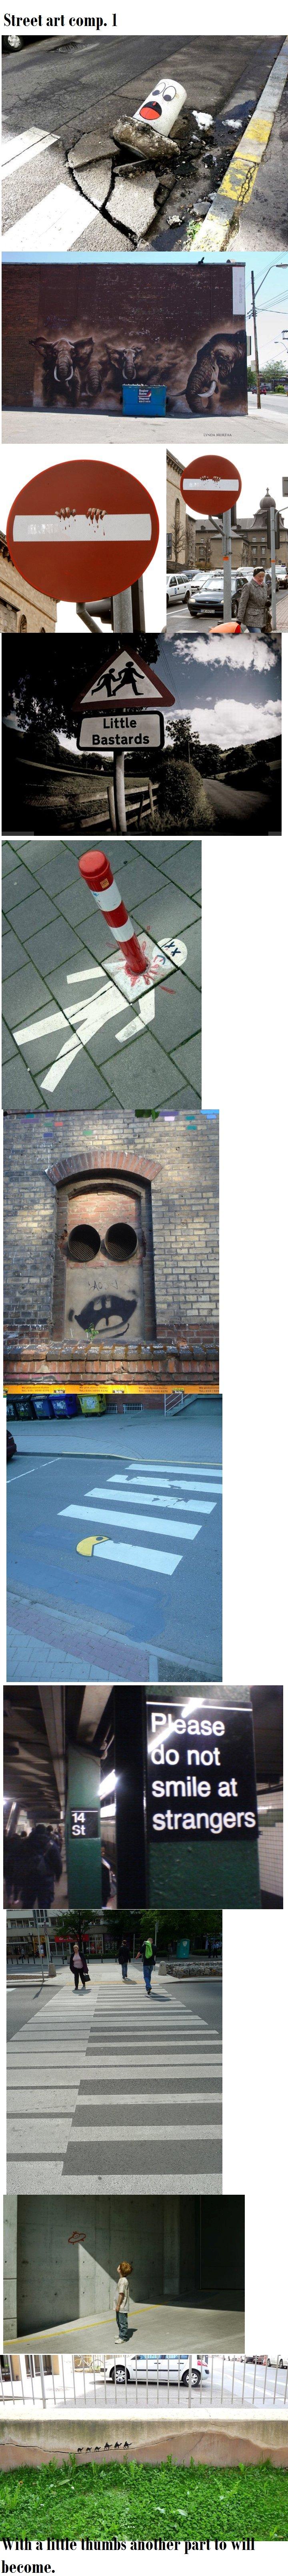 "Street art. Too long? edit: funnyjunk.com/funny_pictures/2355483/Street+art+comp+2/ part 2^ for long?. Street :11'! camp. I ase not smile at A strangers"". longer next time :D Street art comp"